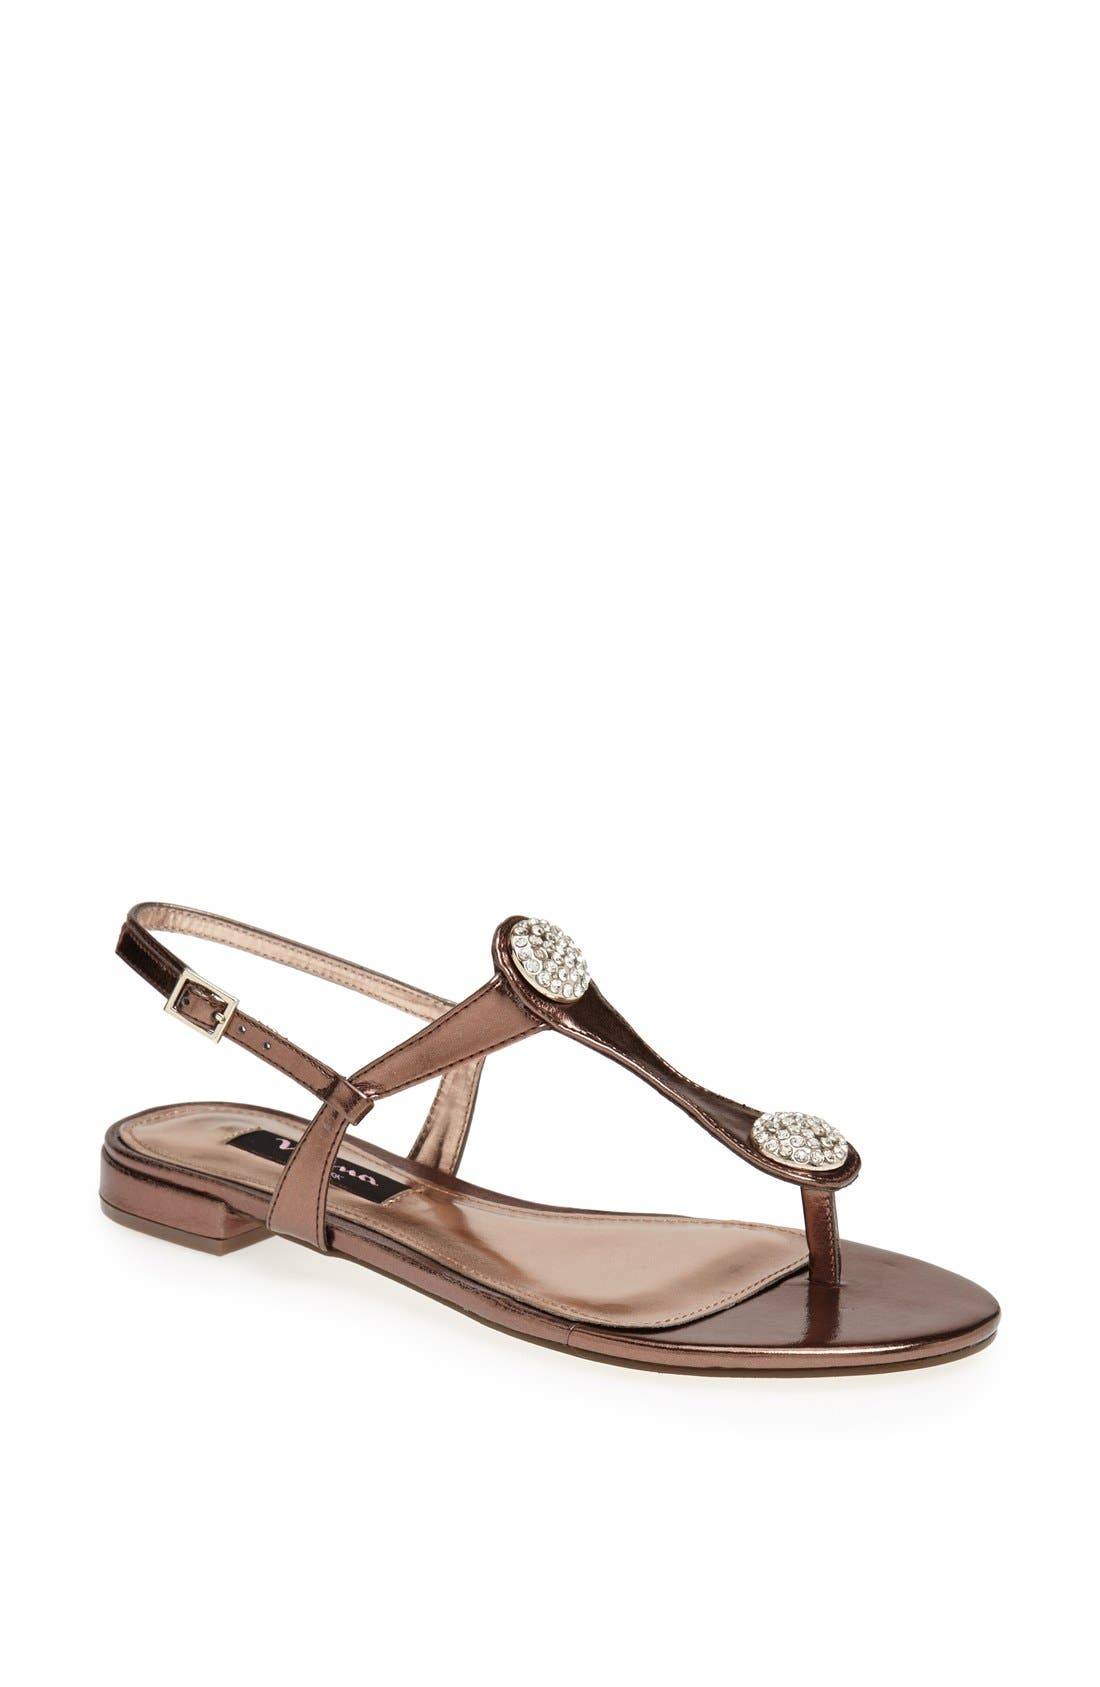 Main Image - Nina 'Darya' Sandal